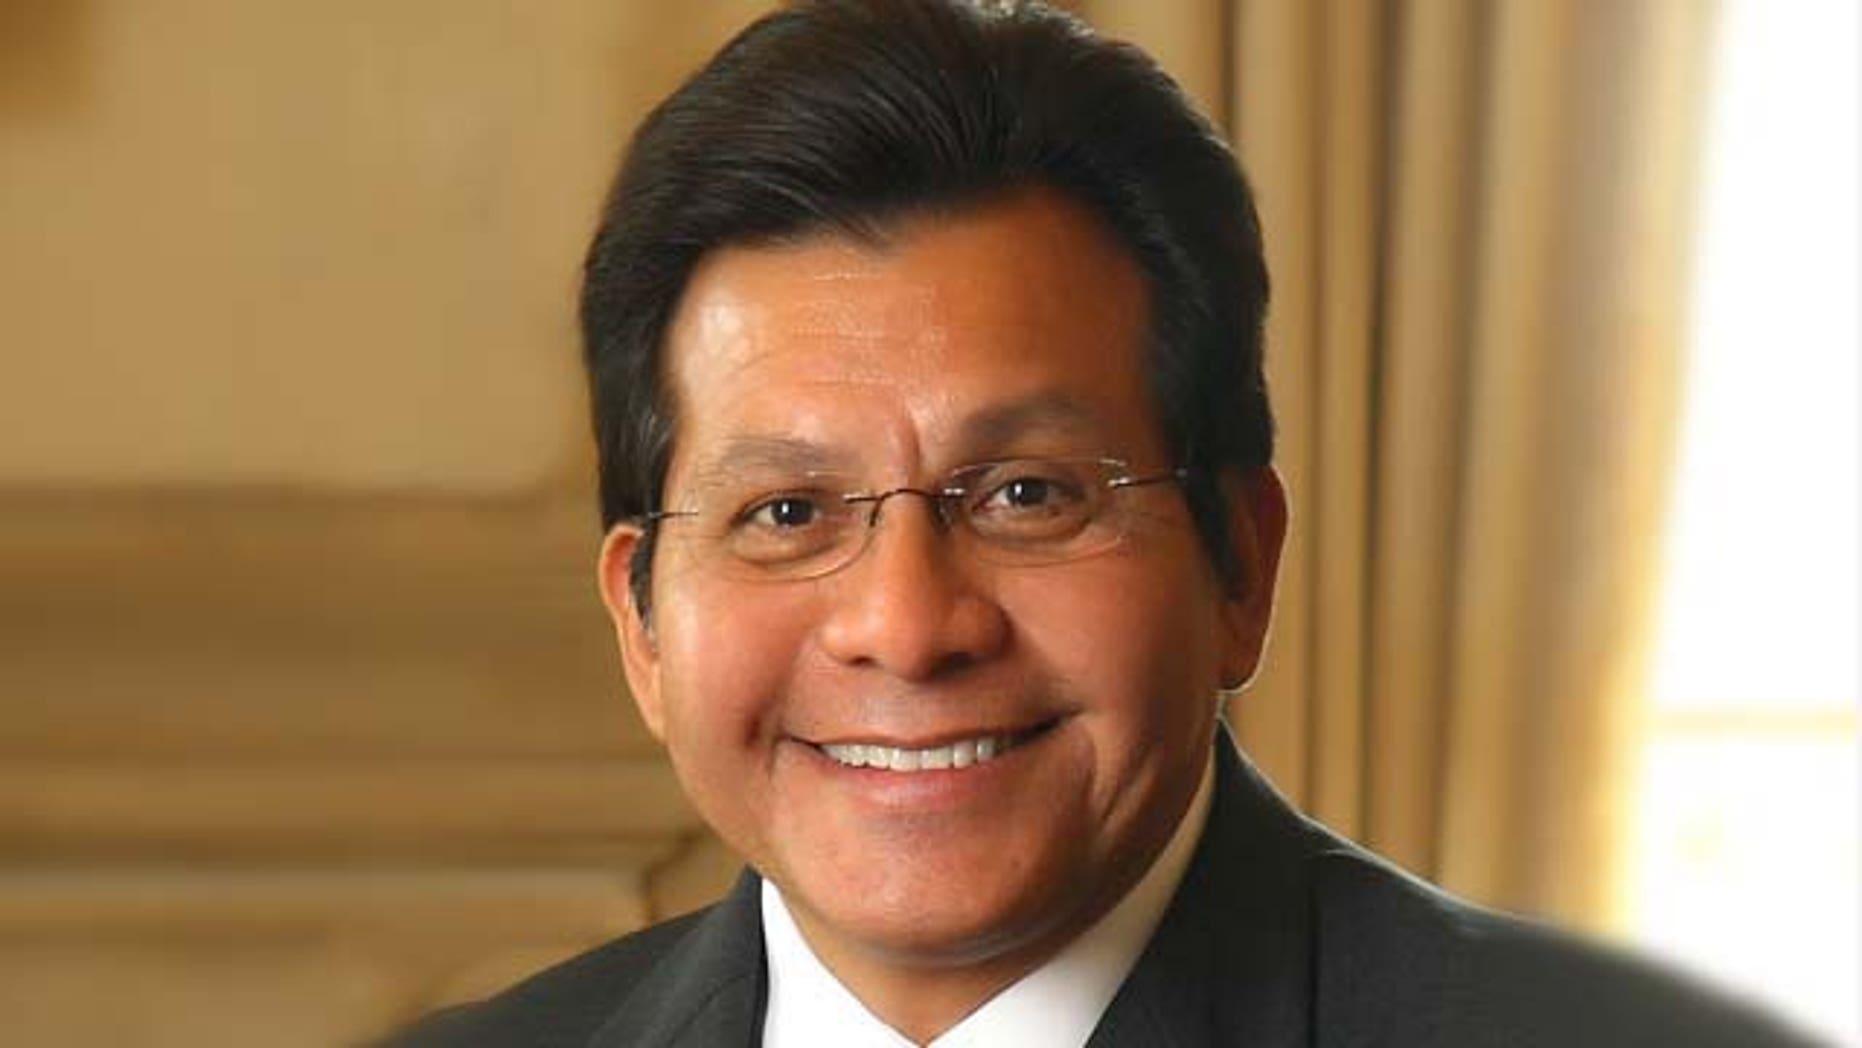 Former Attorney General Alberto Gonzales.